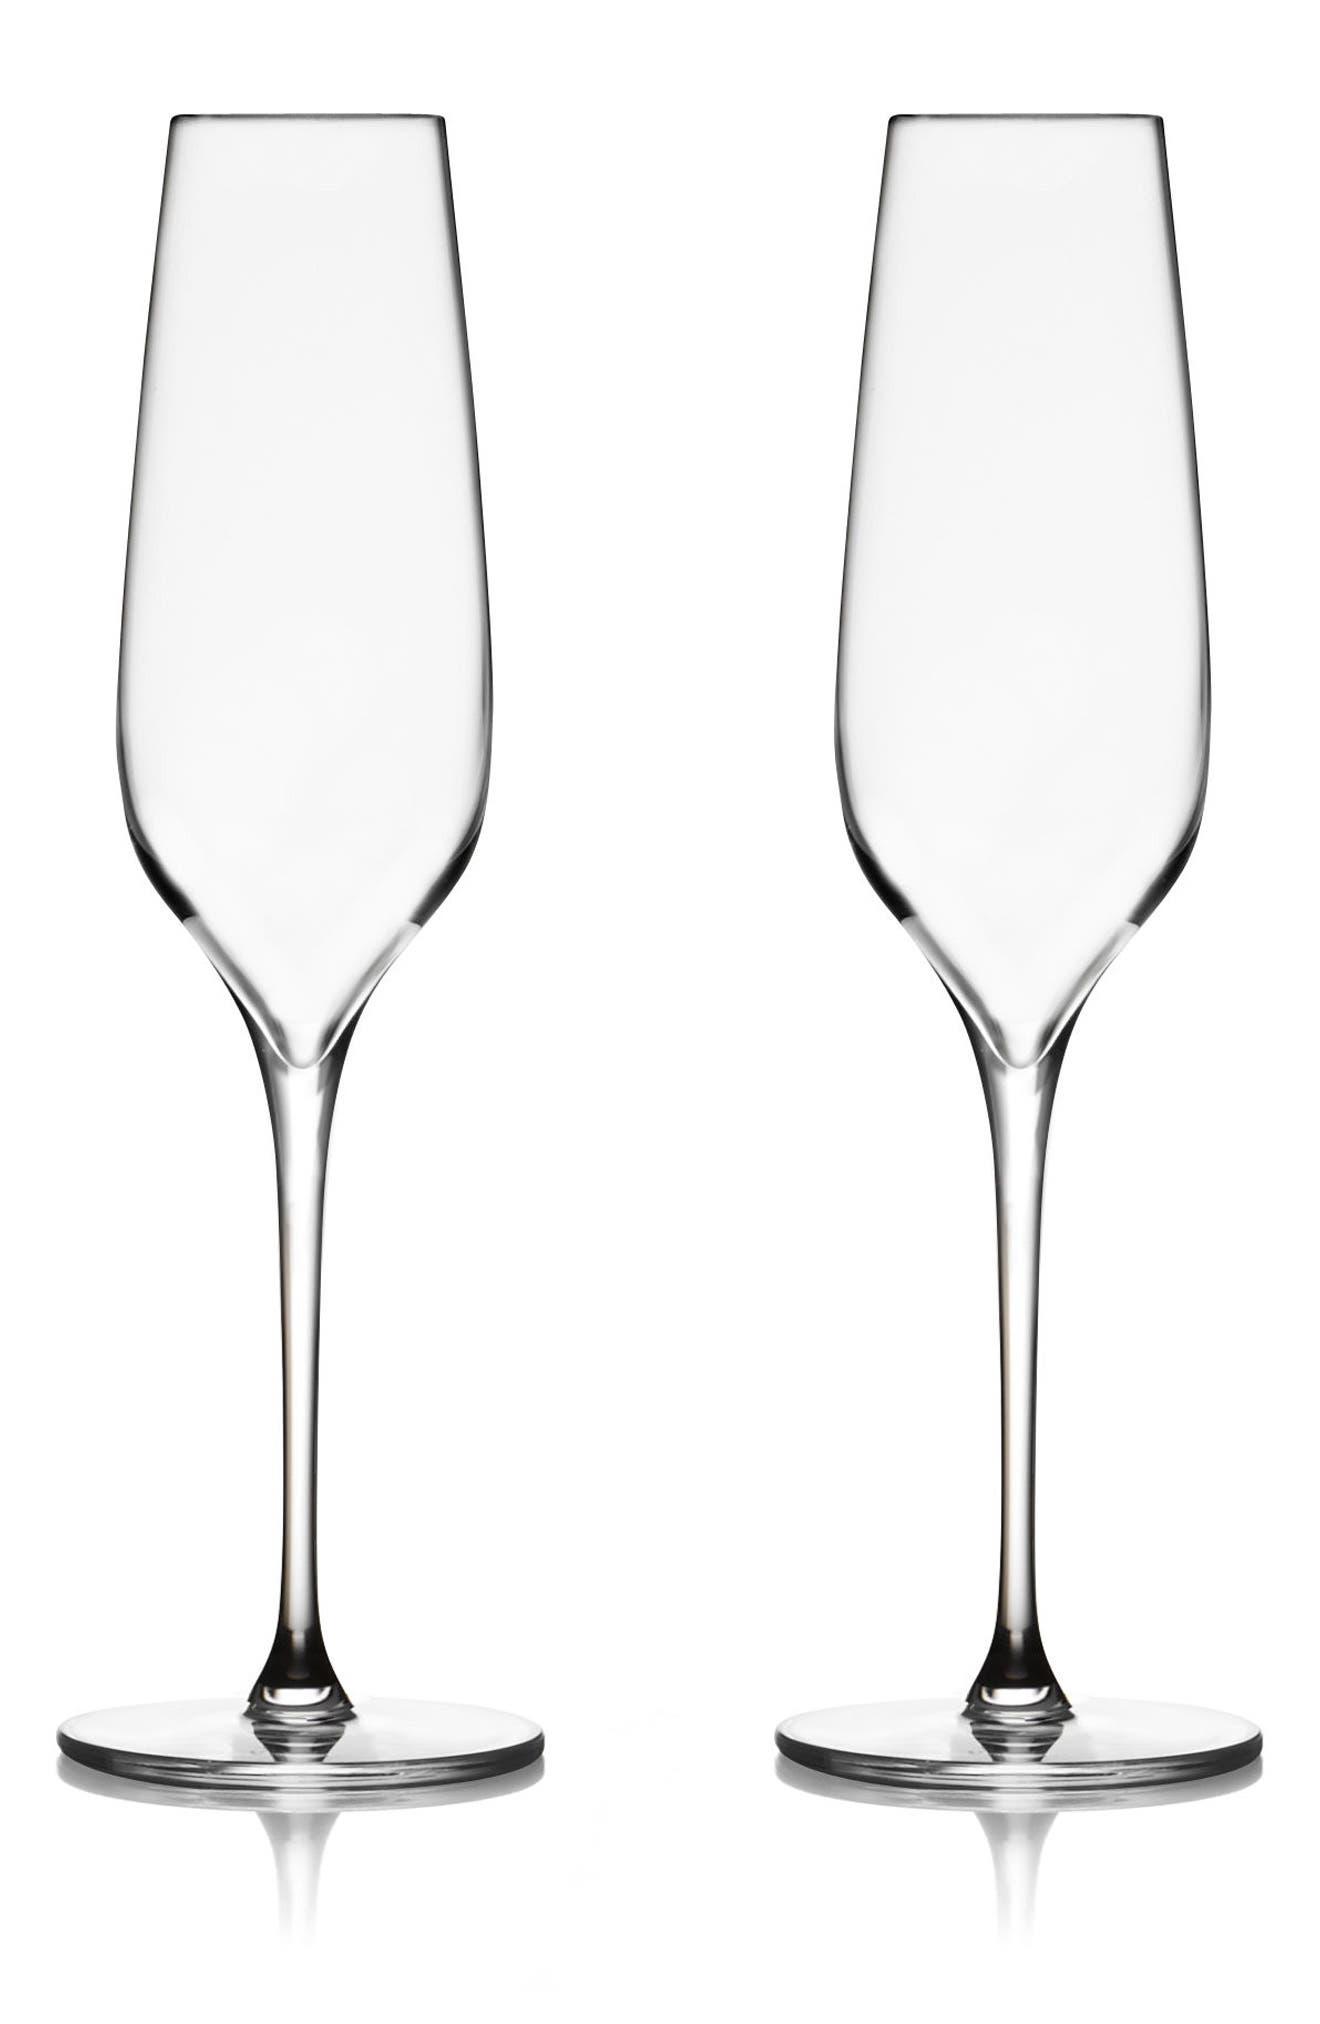 Main Image - Nambé Vie Set of 2 Champagne Flutes